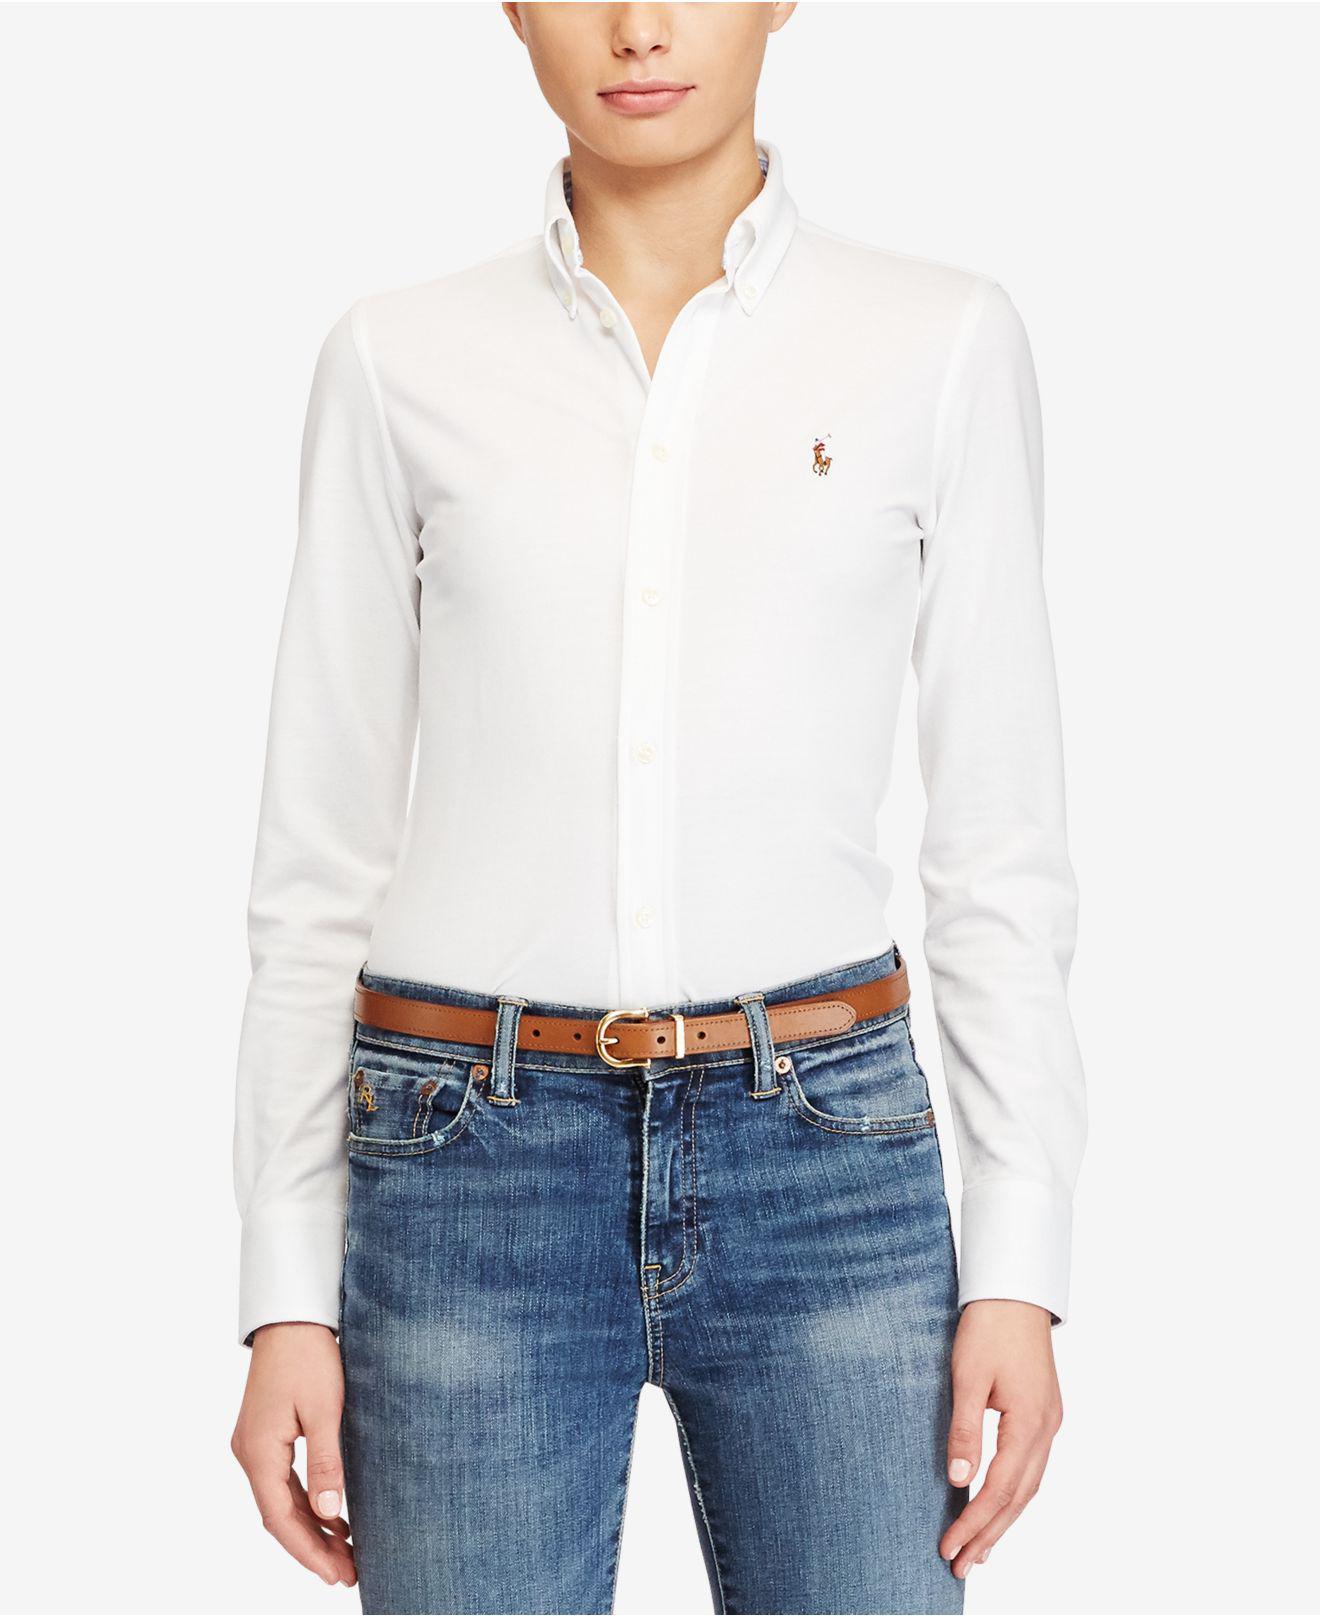 16b46341124a Lyst - Polo Ralph Lauren Long-sleeve Button-front Shirt in White ...